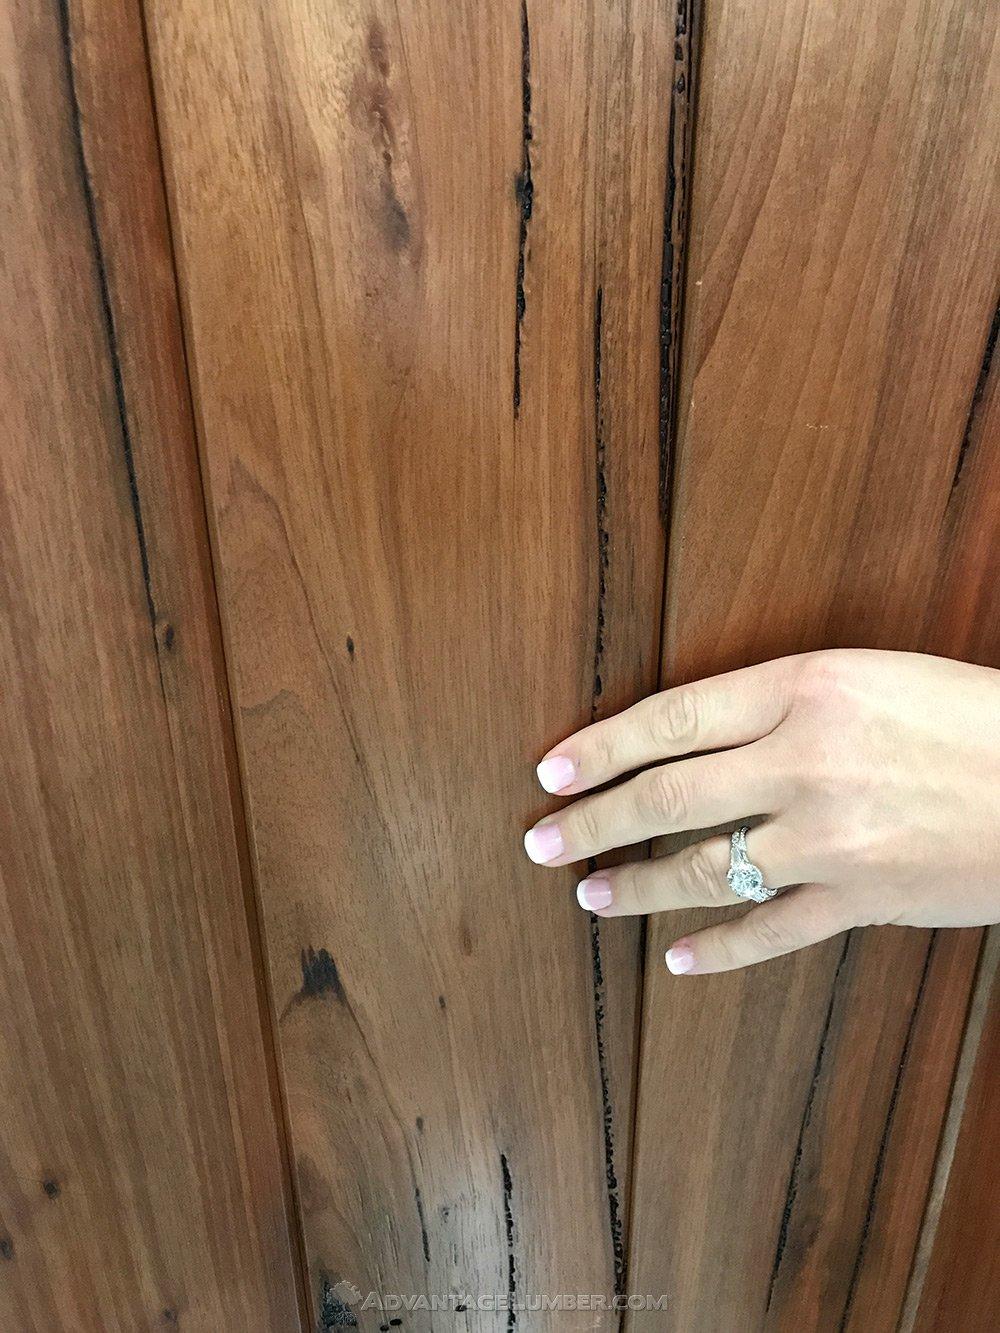 pecky bolivian walnut detail